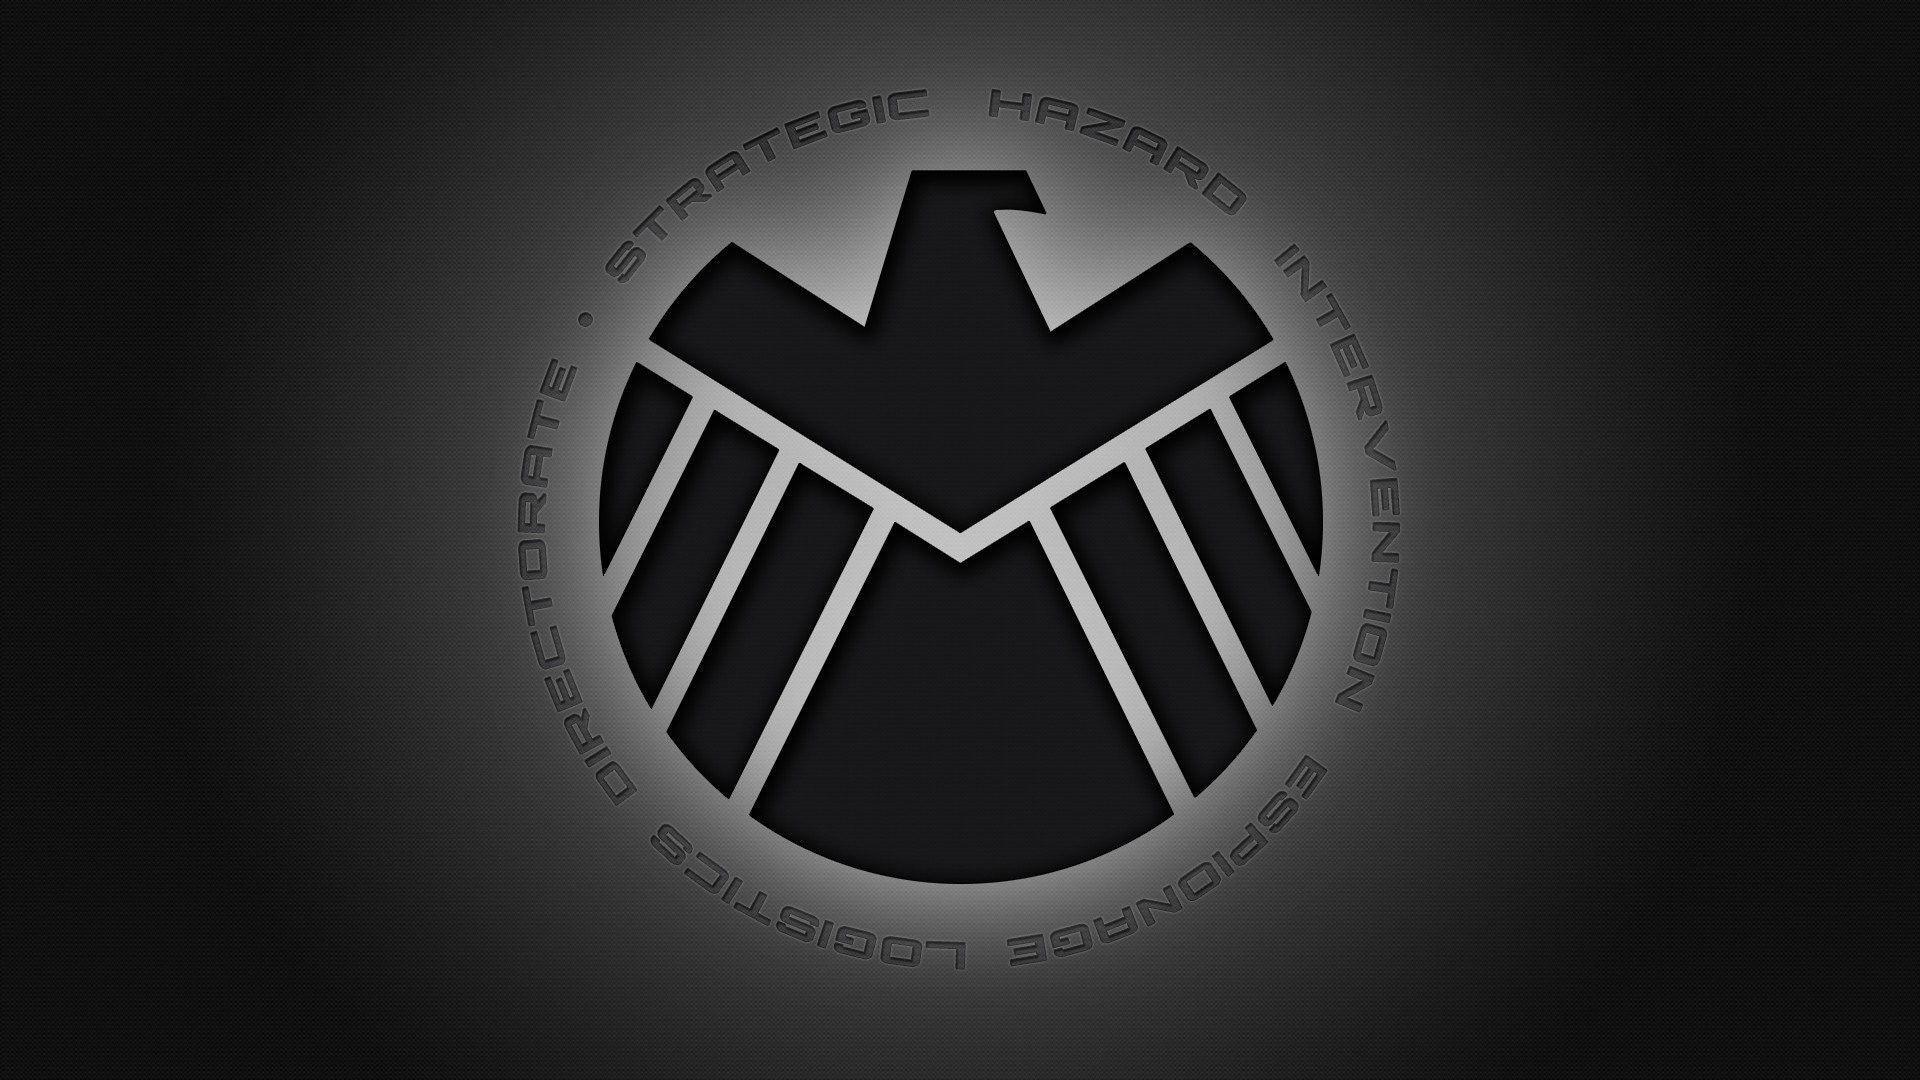 4k Marvel Shield Wallpapers Top Free 4k Marvel Shield